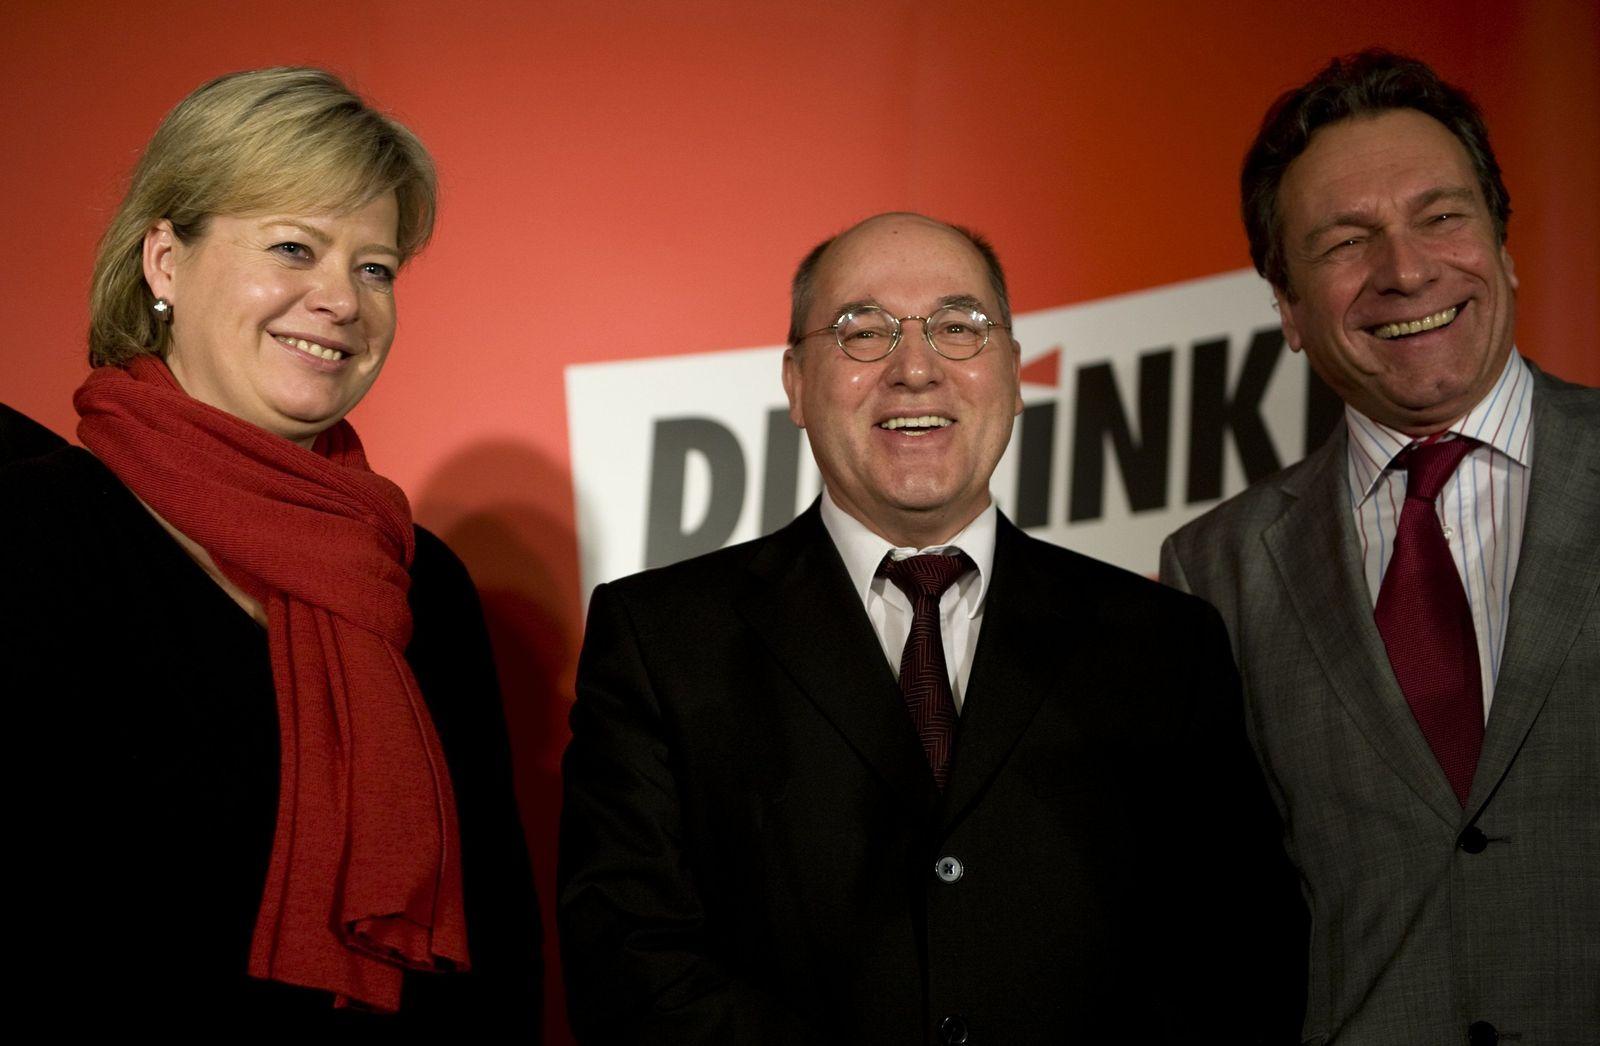 Lötzsch / Gysi / Ernst